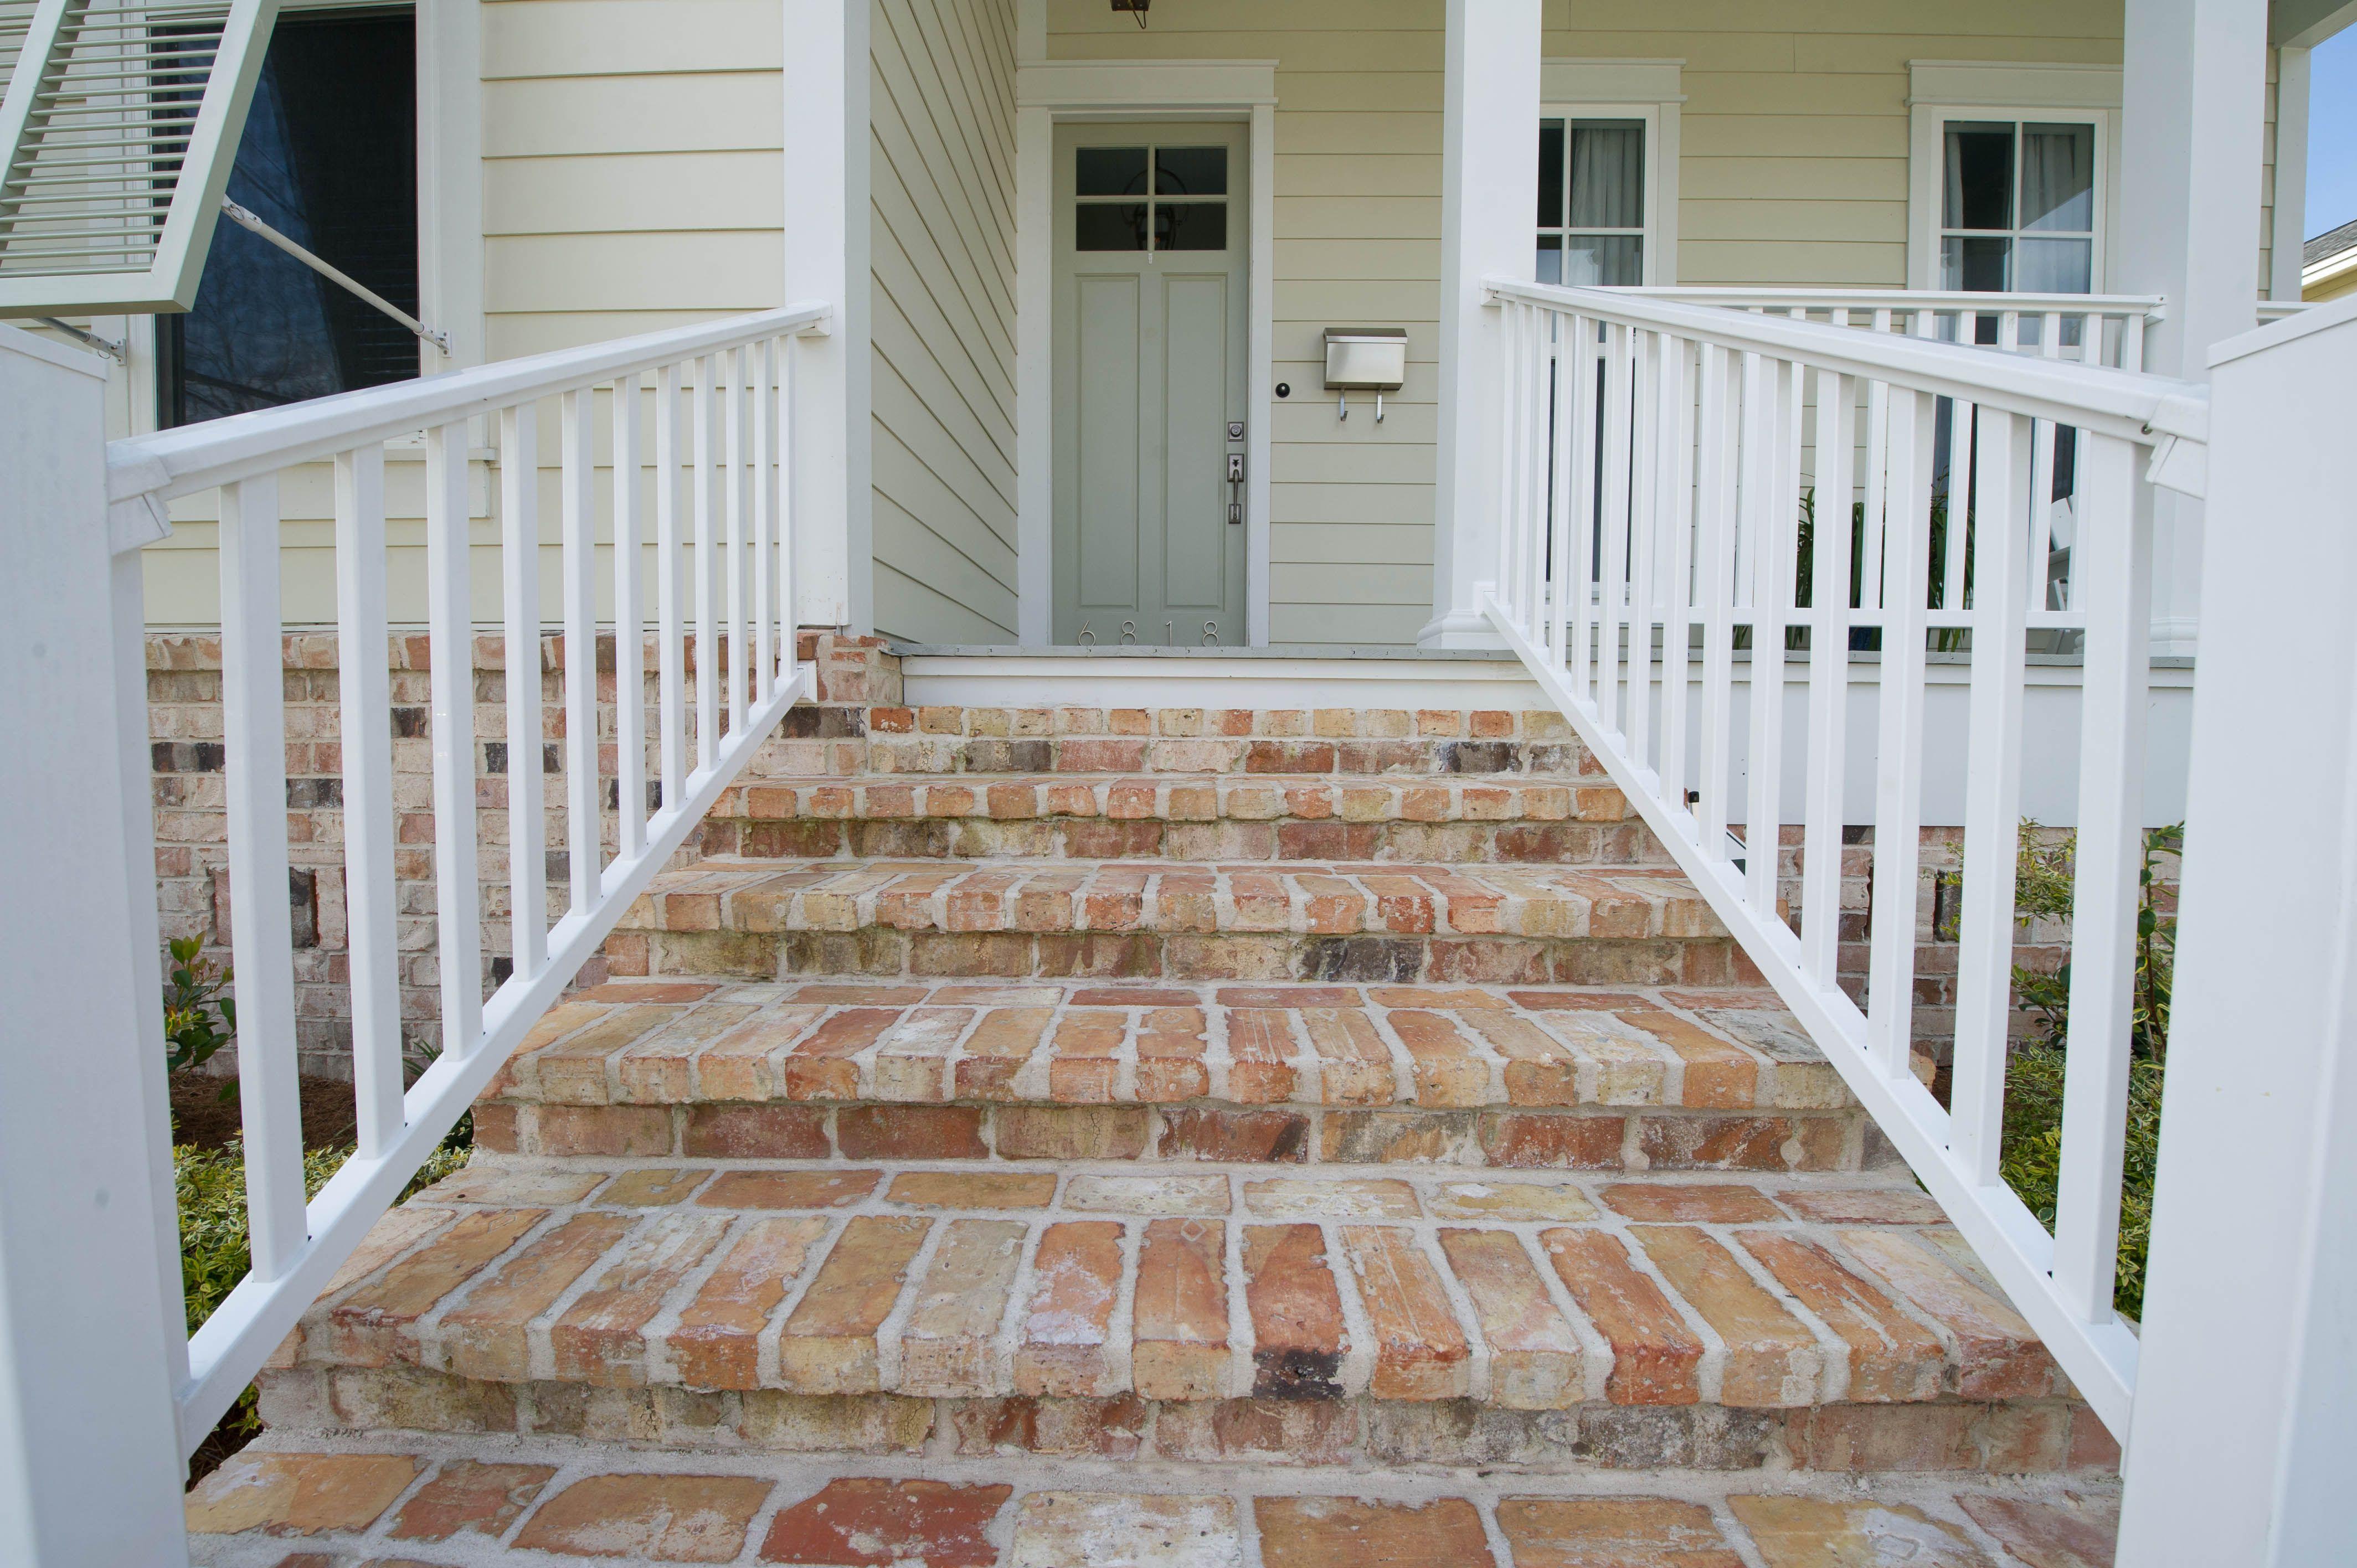 Reclaimed Antique Brick Steps